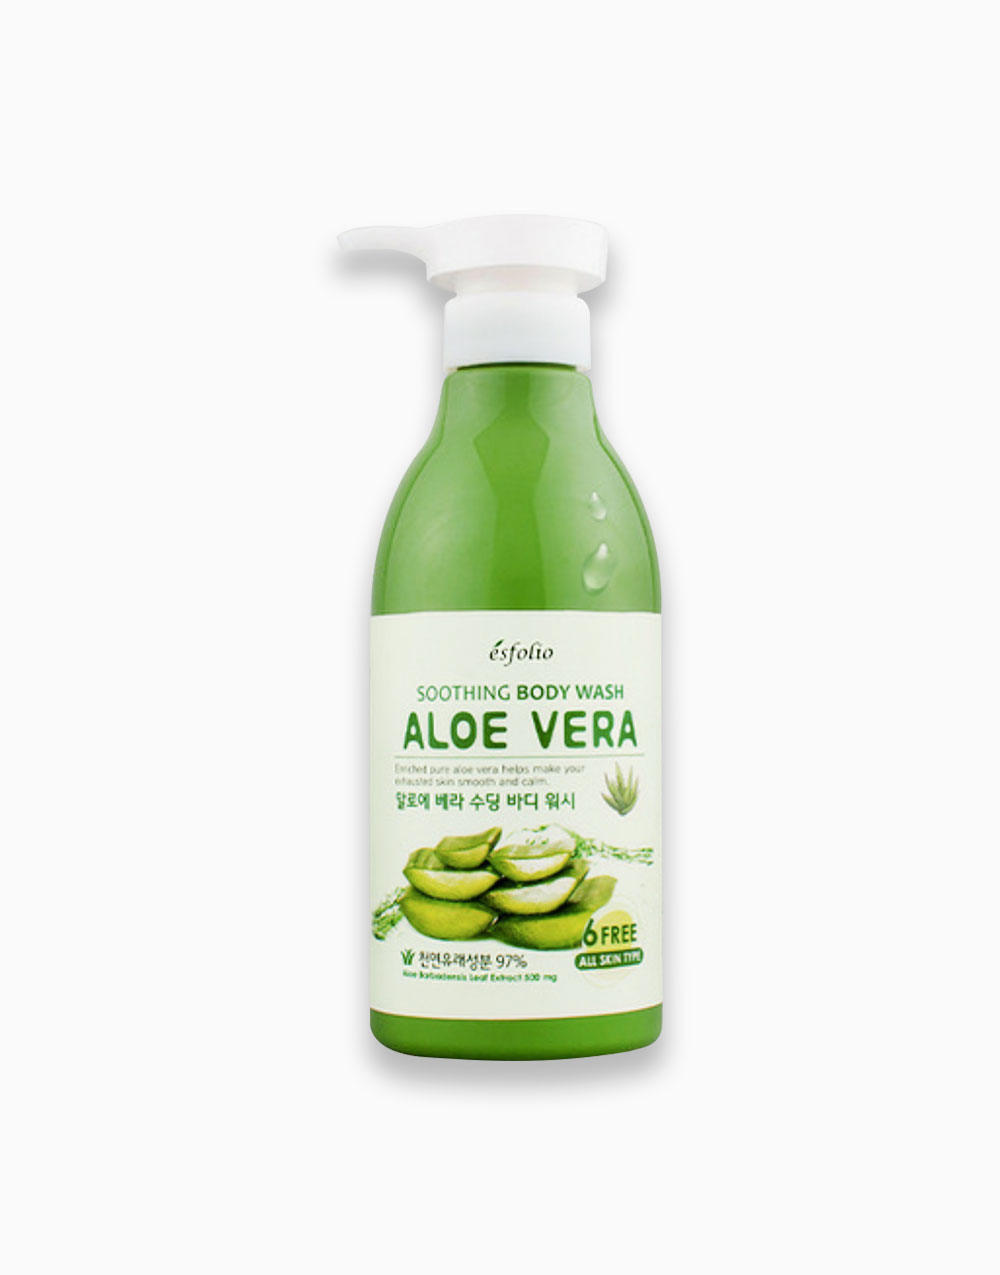 Aloe Vera Soothing Body Wash by Esfolio